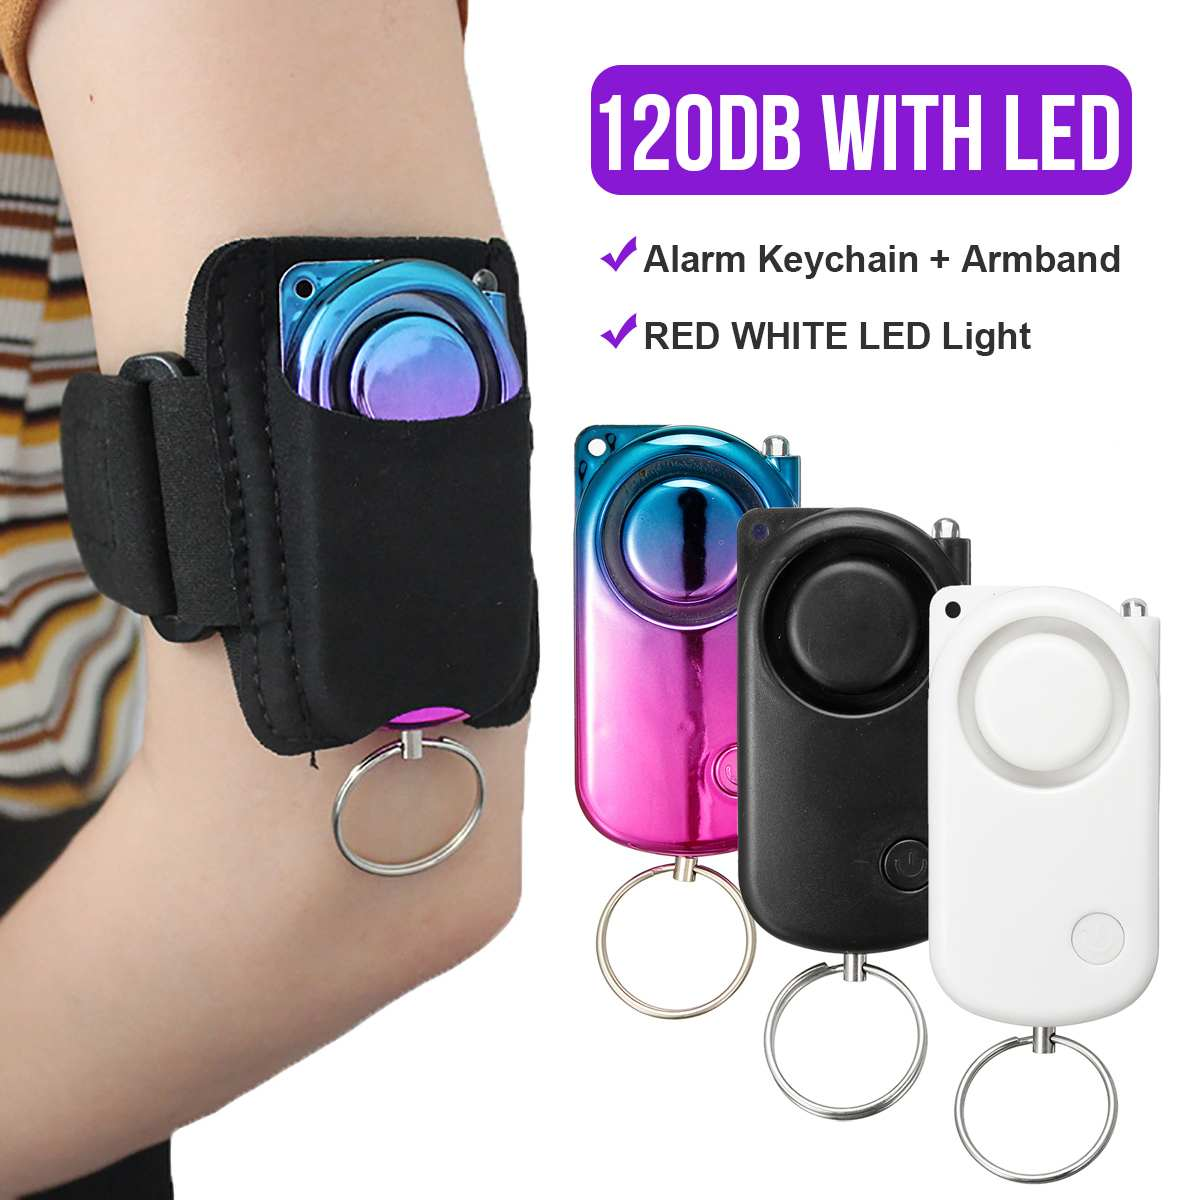 Night Run Personal Alarm Protection Women Elderly Defensa Safety Self Defense Alarm Sound Anti-Attack Security Keychain Alarm